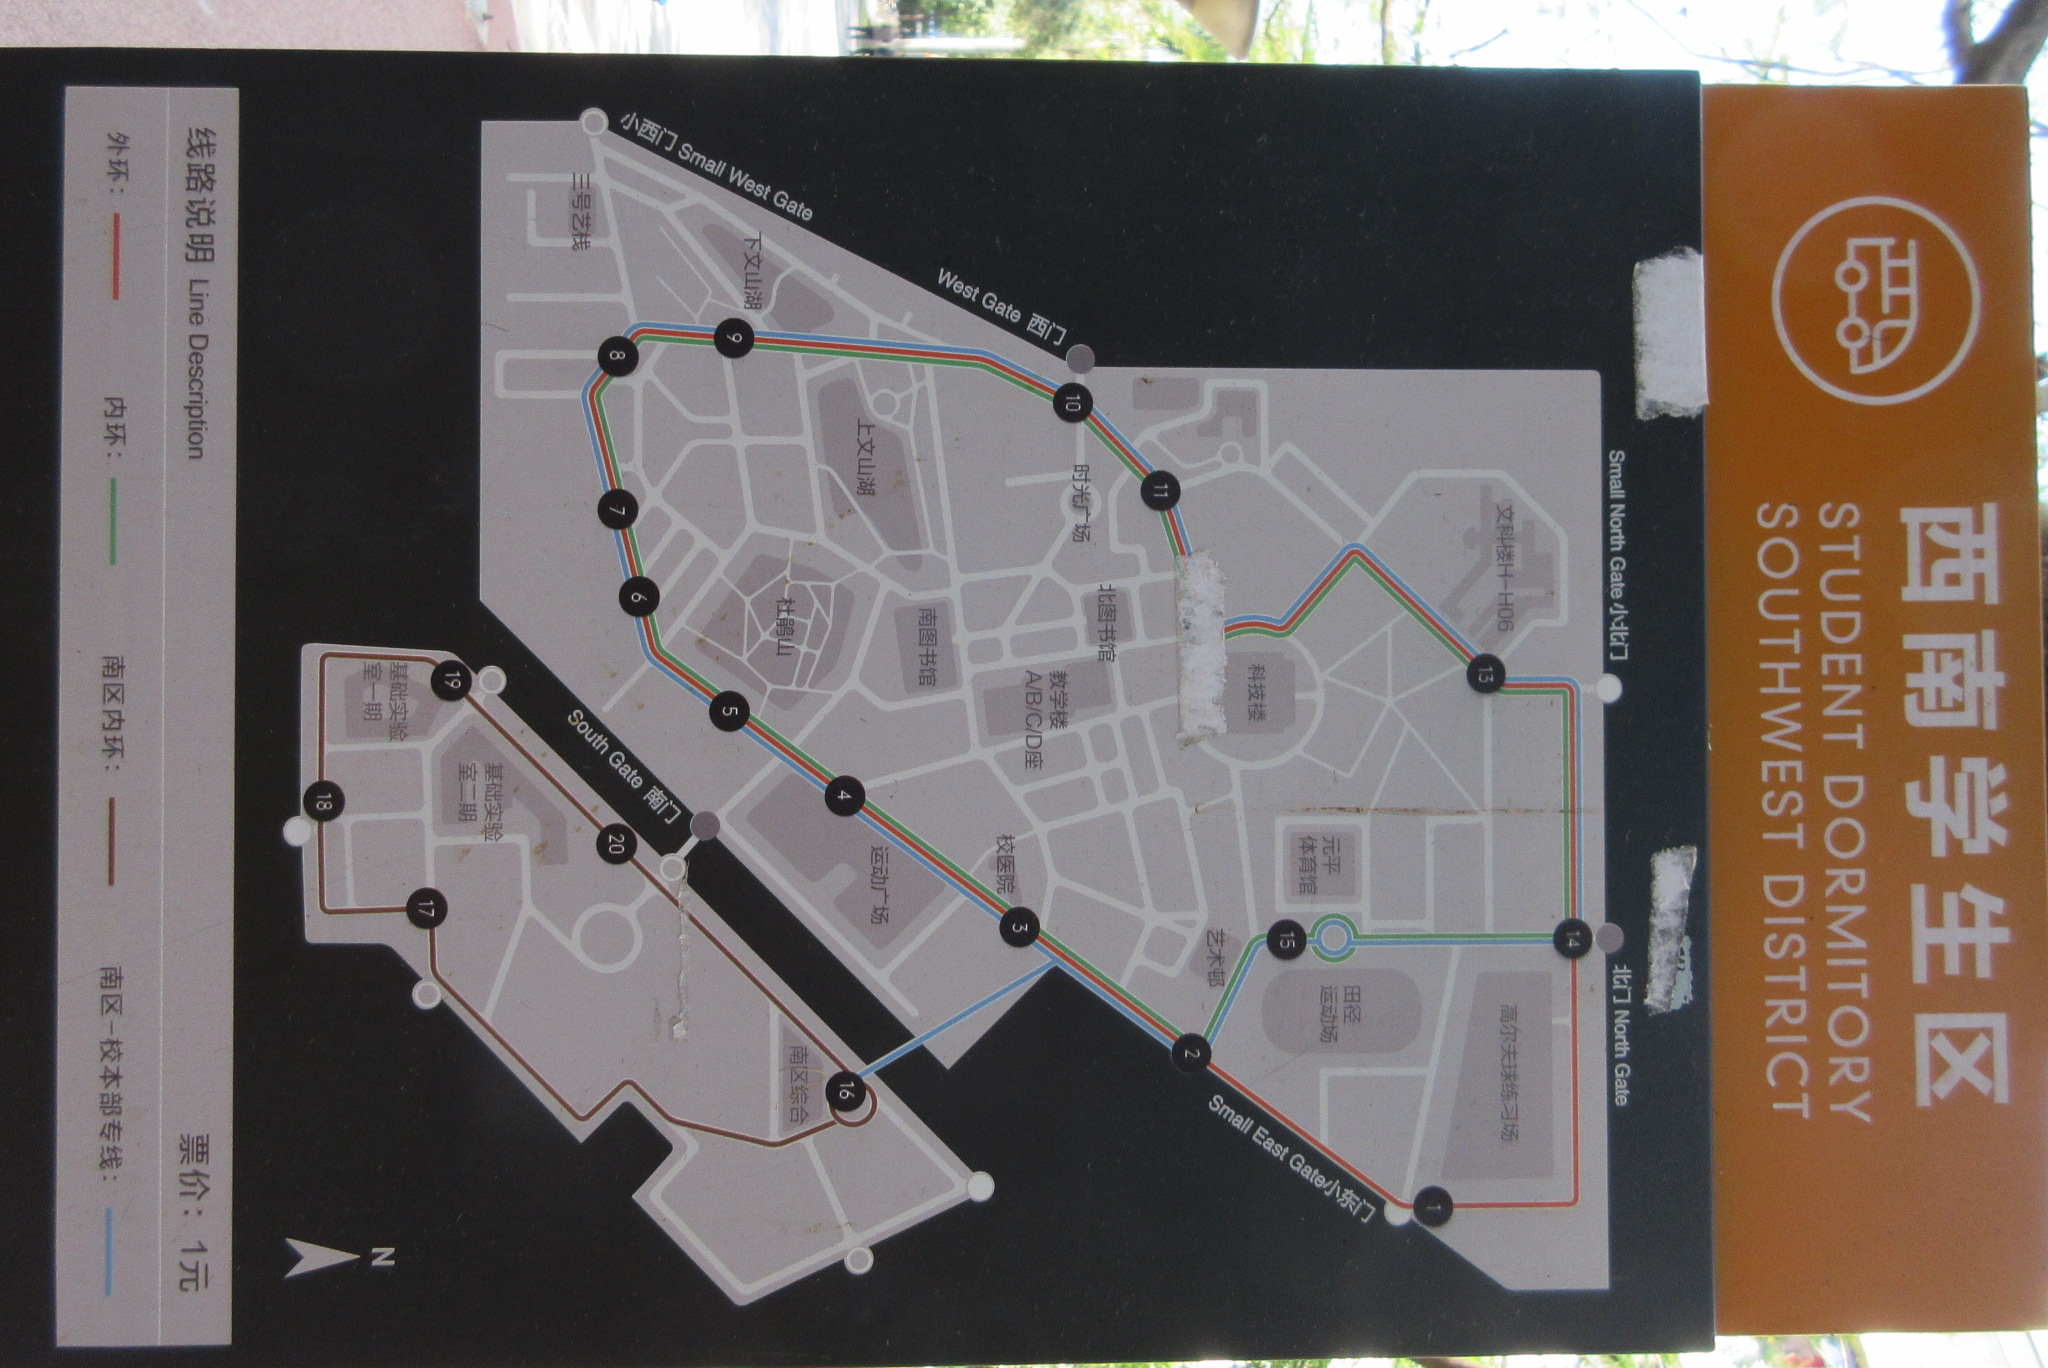 File:SZ 深圳大學 Shenzhen University 南山區 Nanshan campus map Feb